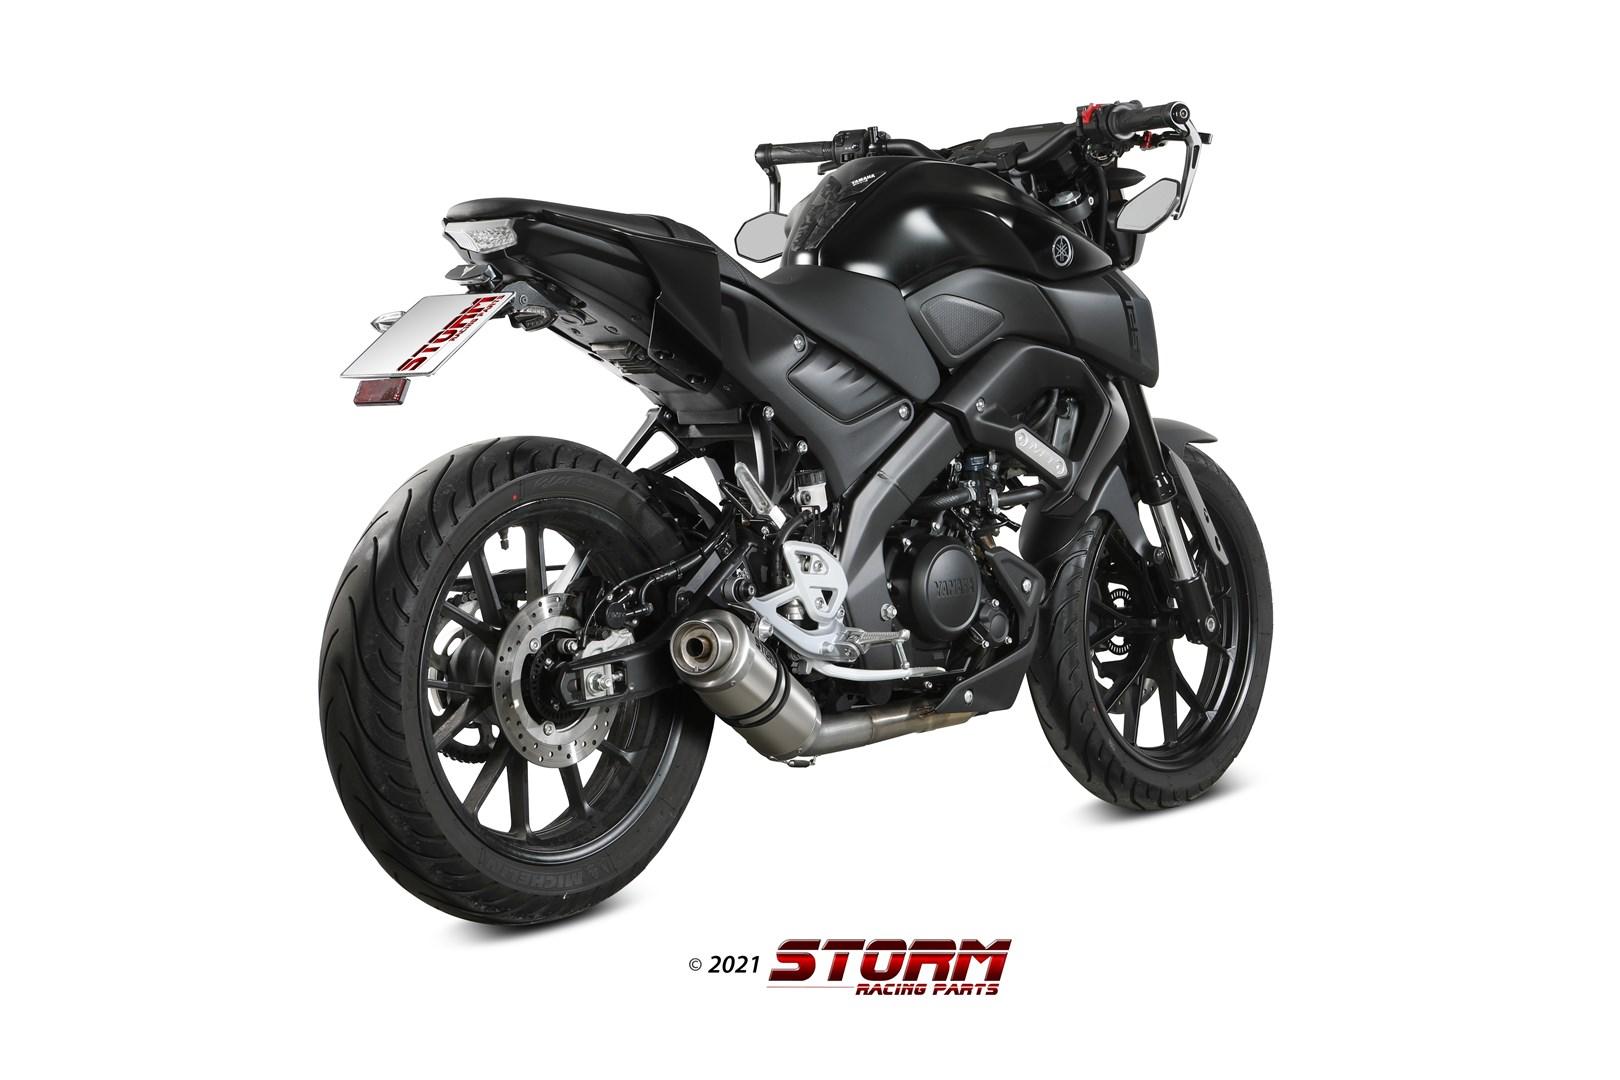 Yamaha_MT125_2021-_74Y067LXS_$02